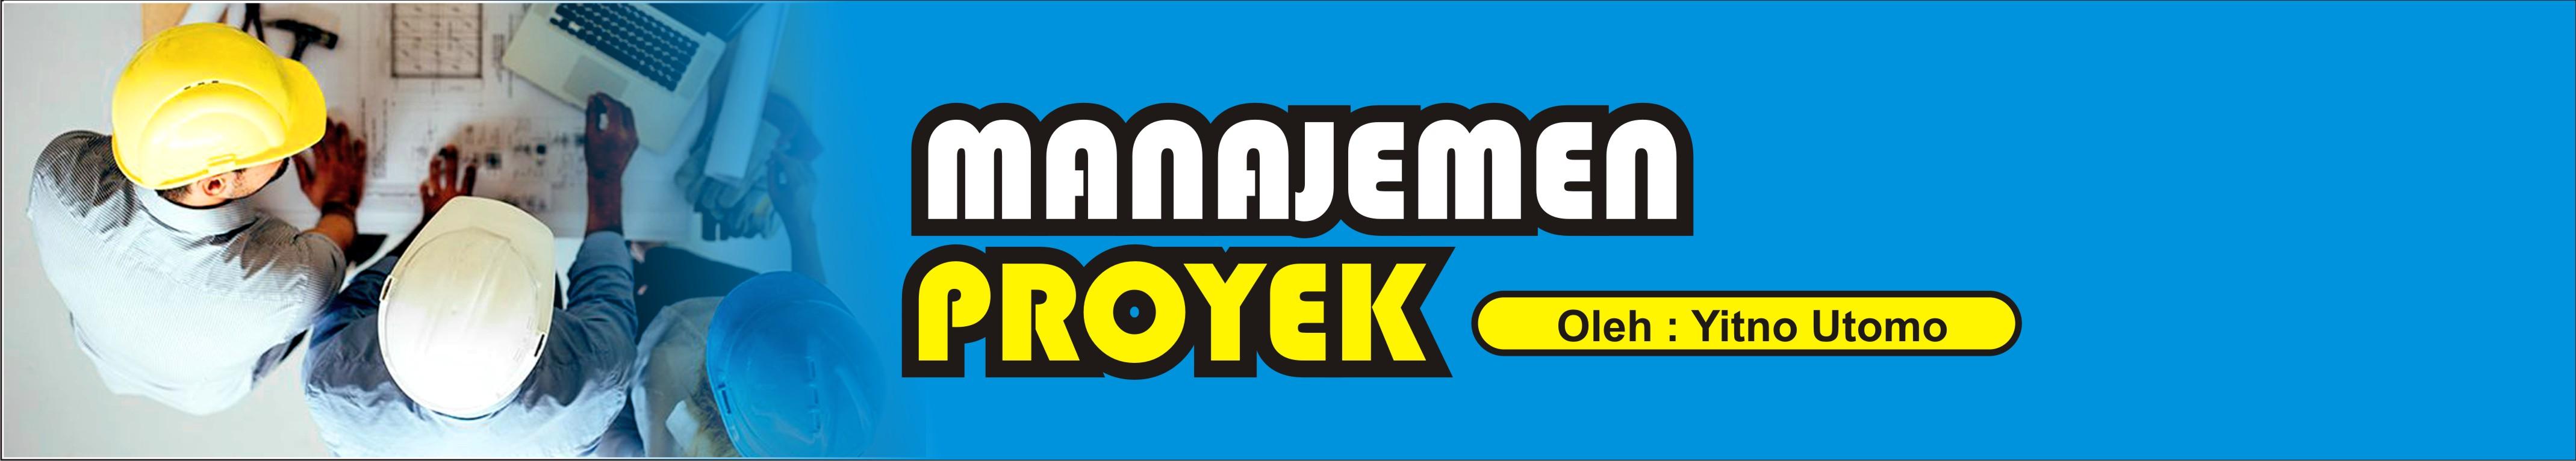 2019 - B - MANAJEMEN PROYEK